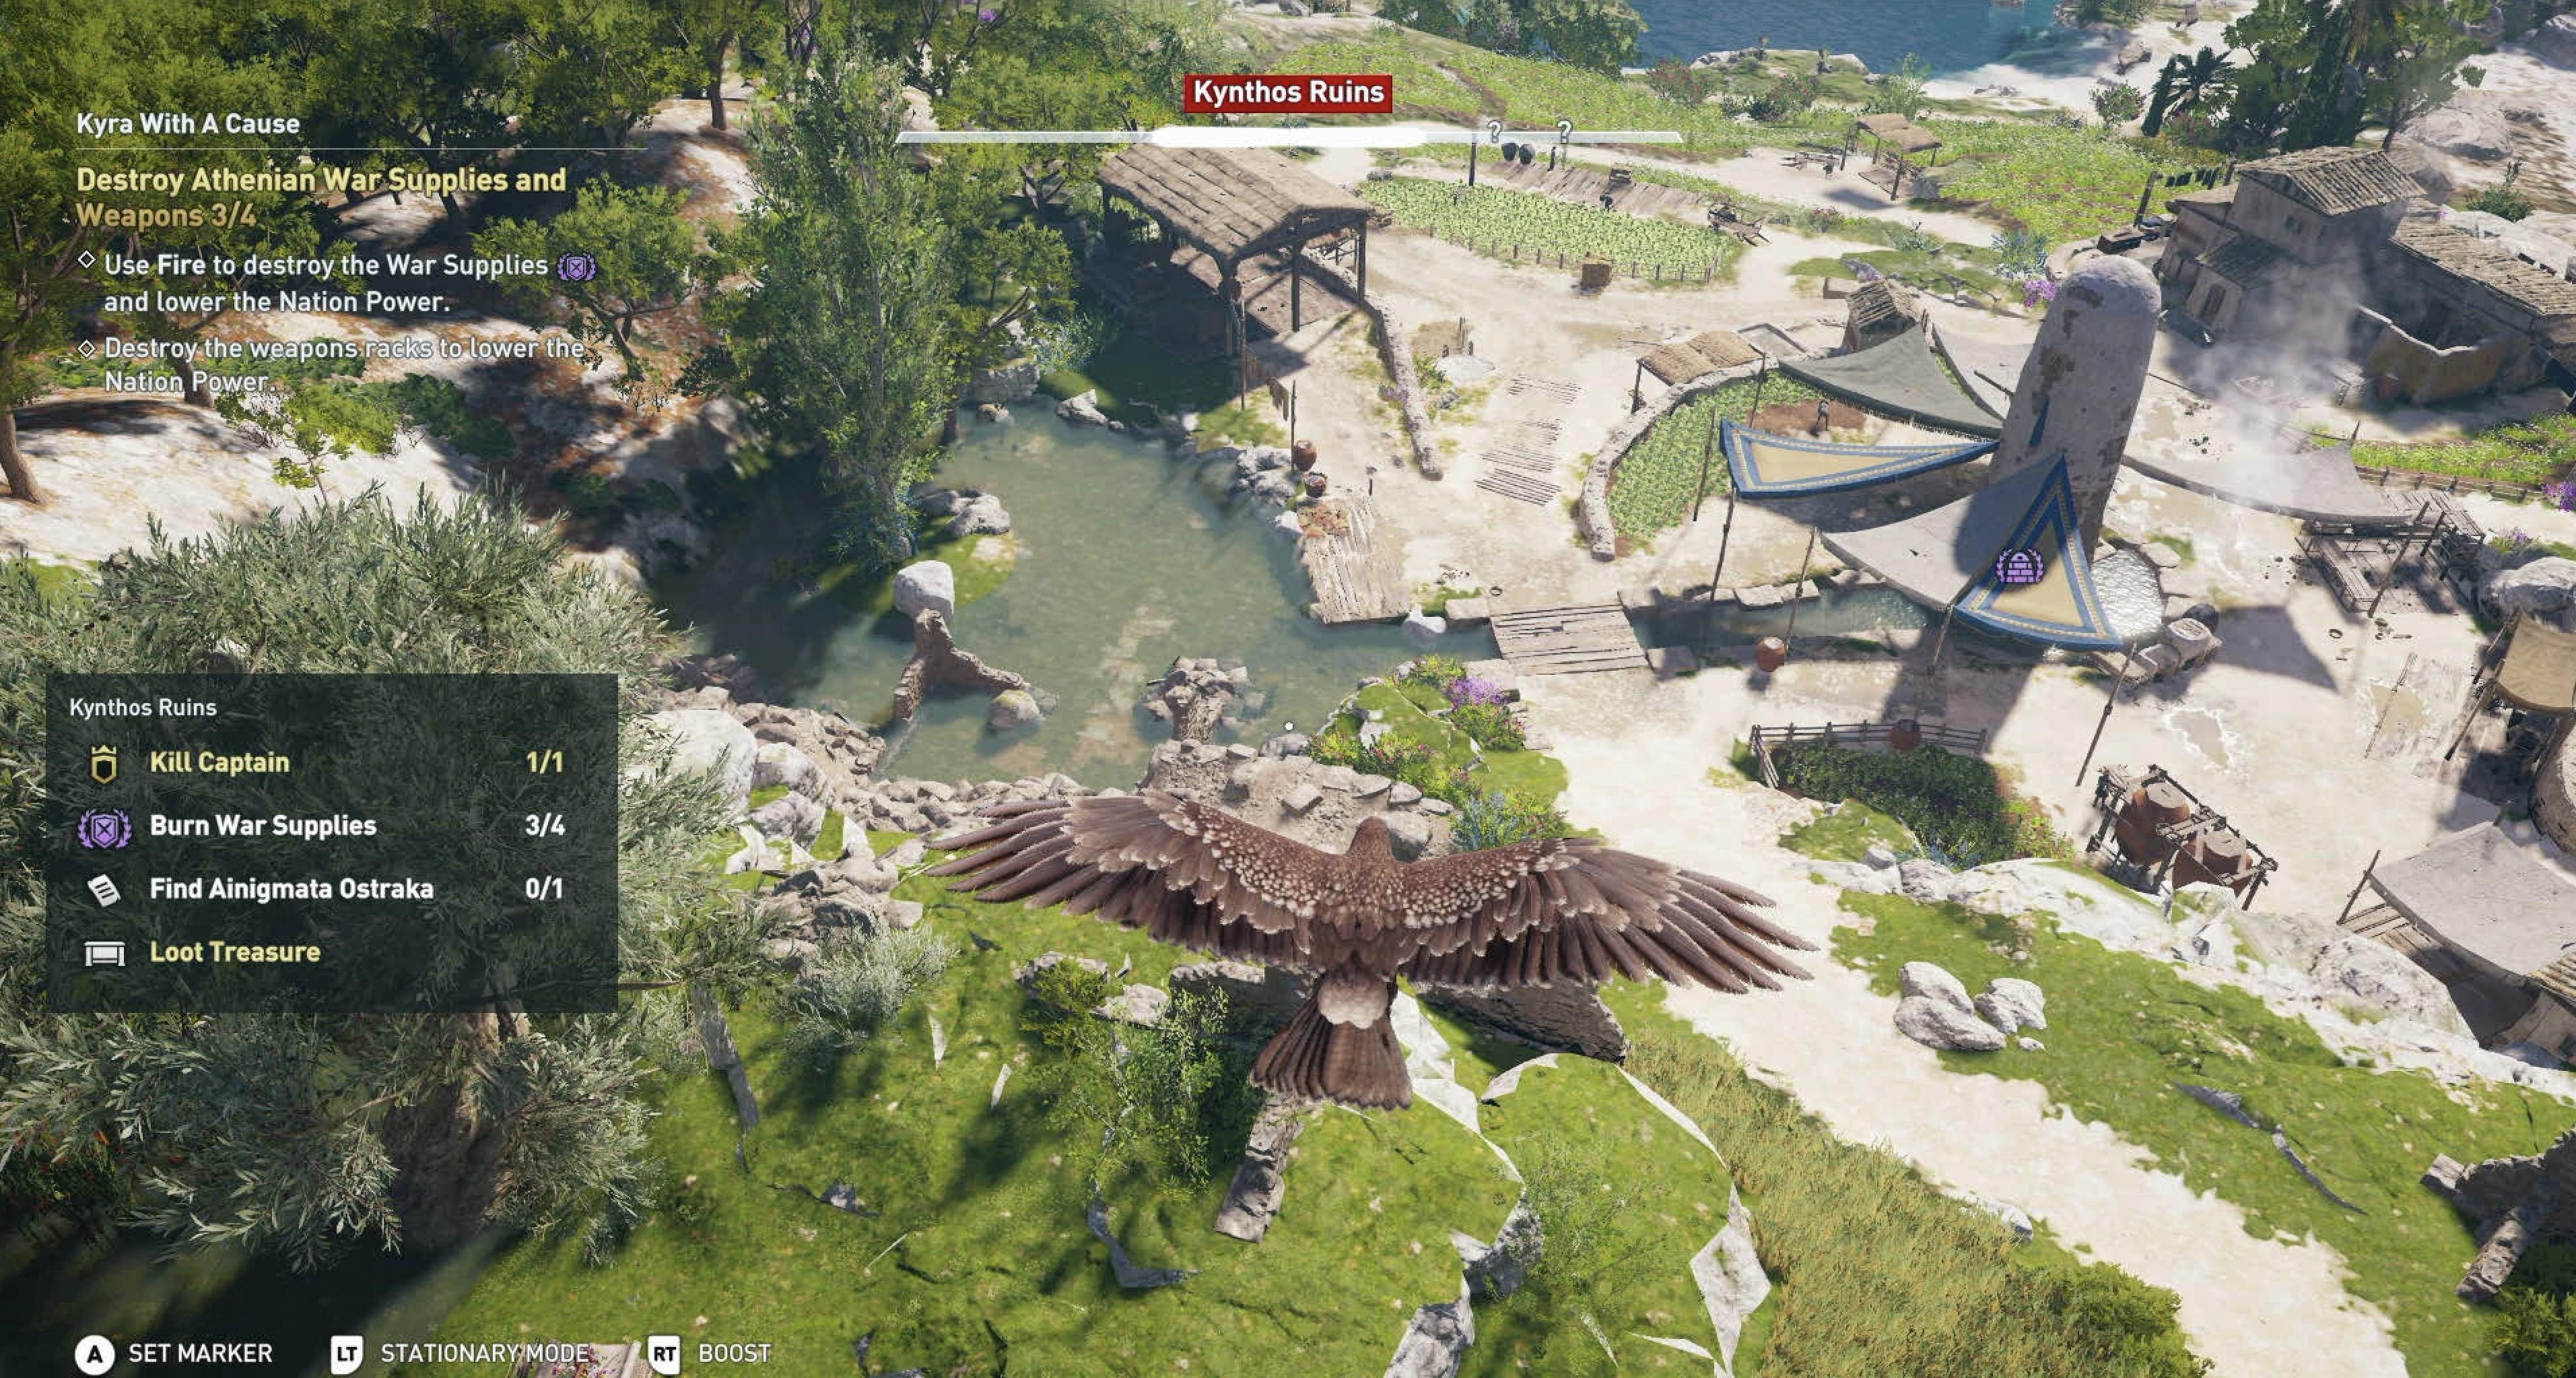 Assassin's Creed Odyssey | خرید سی دی کی و نسخه اورجینال بازی - ایران استیم